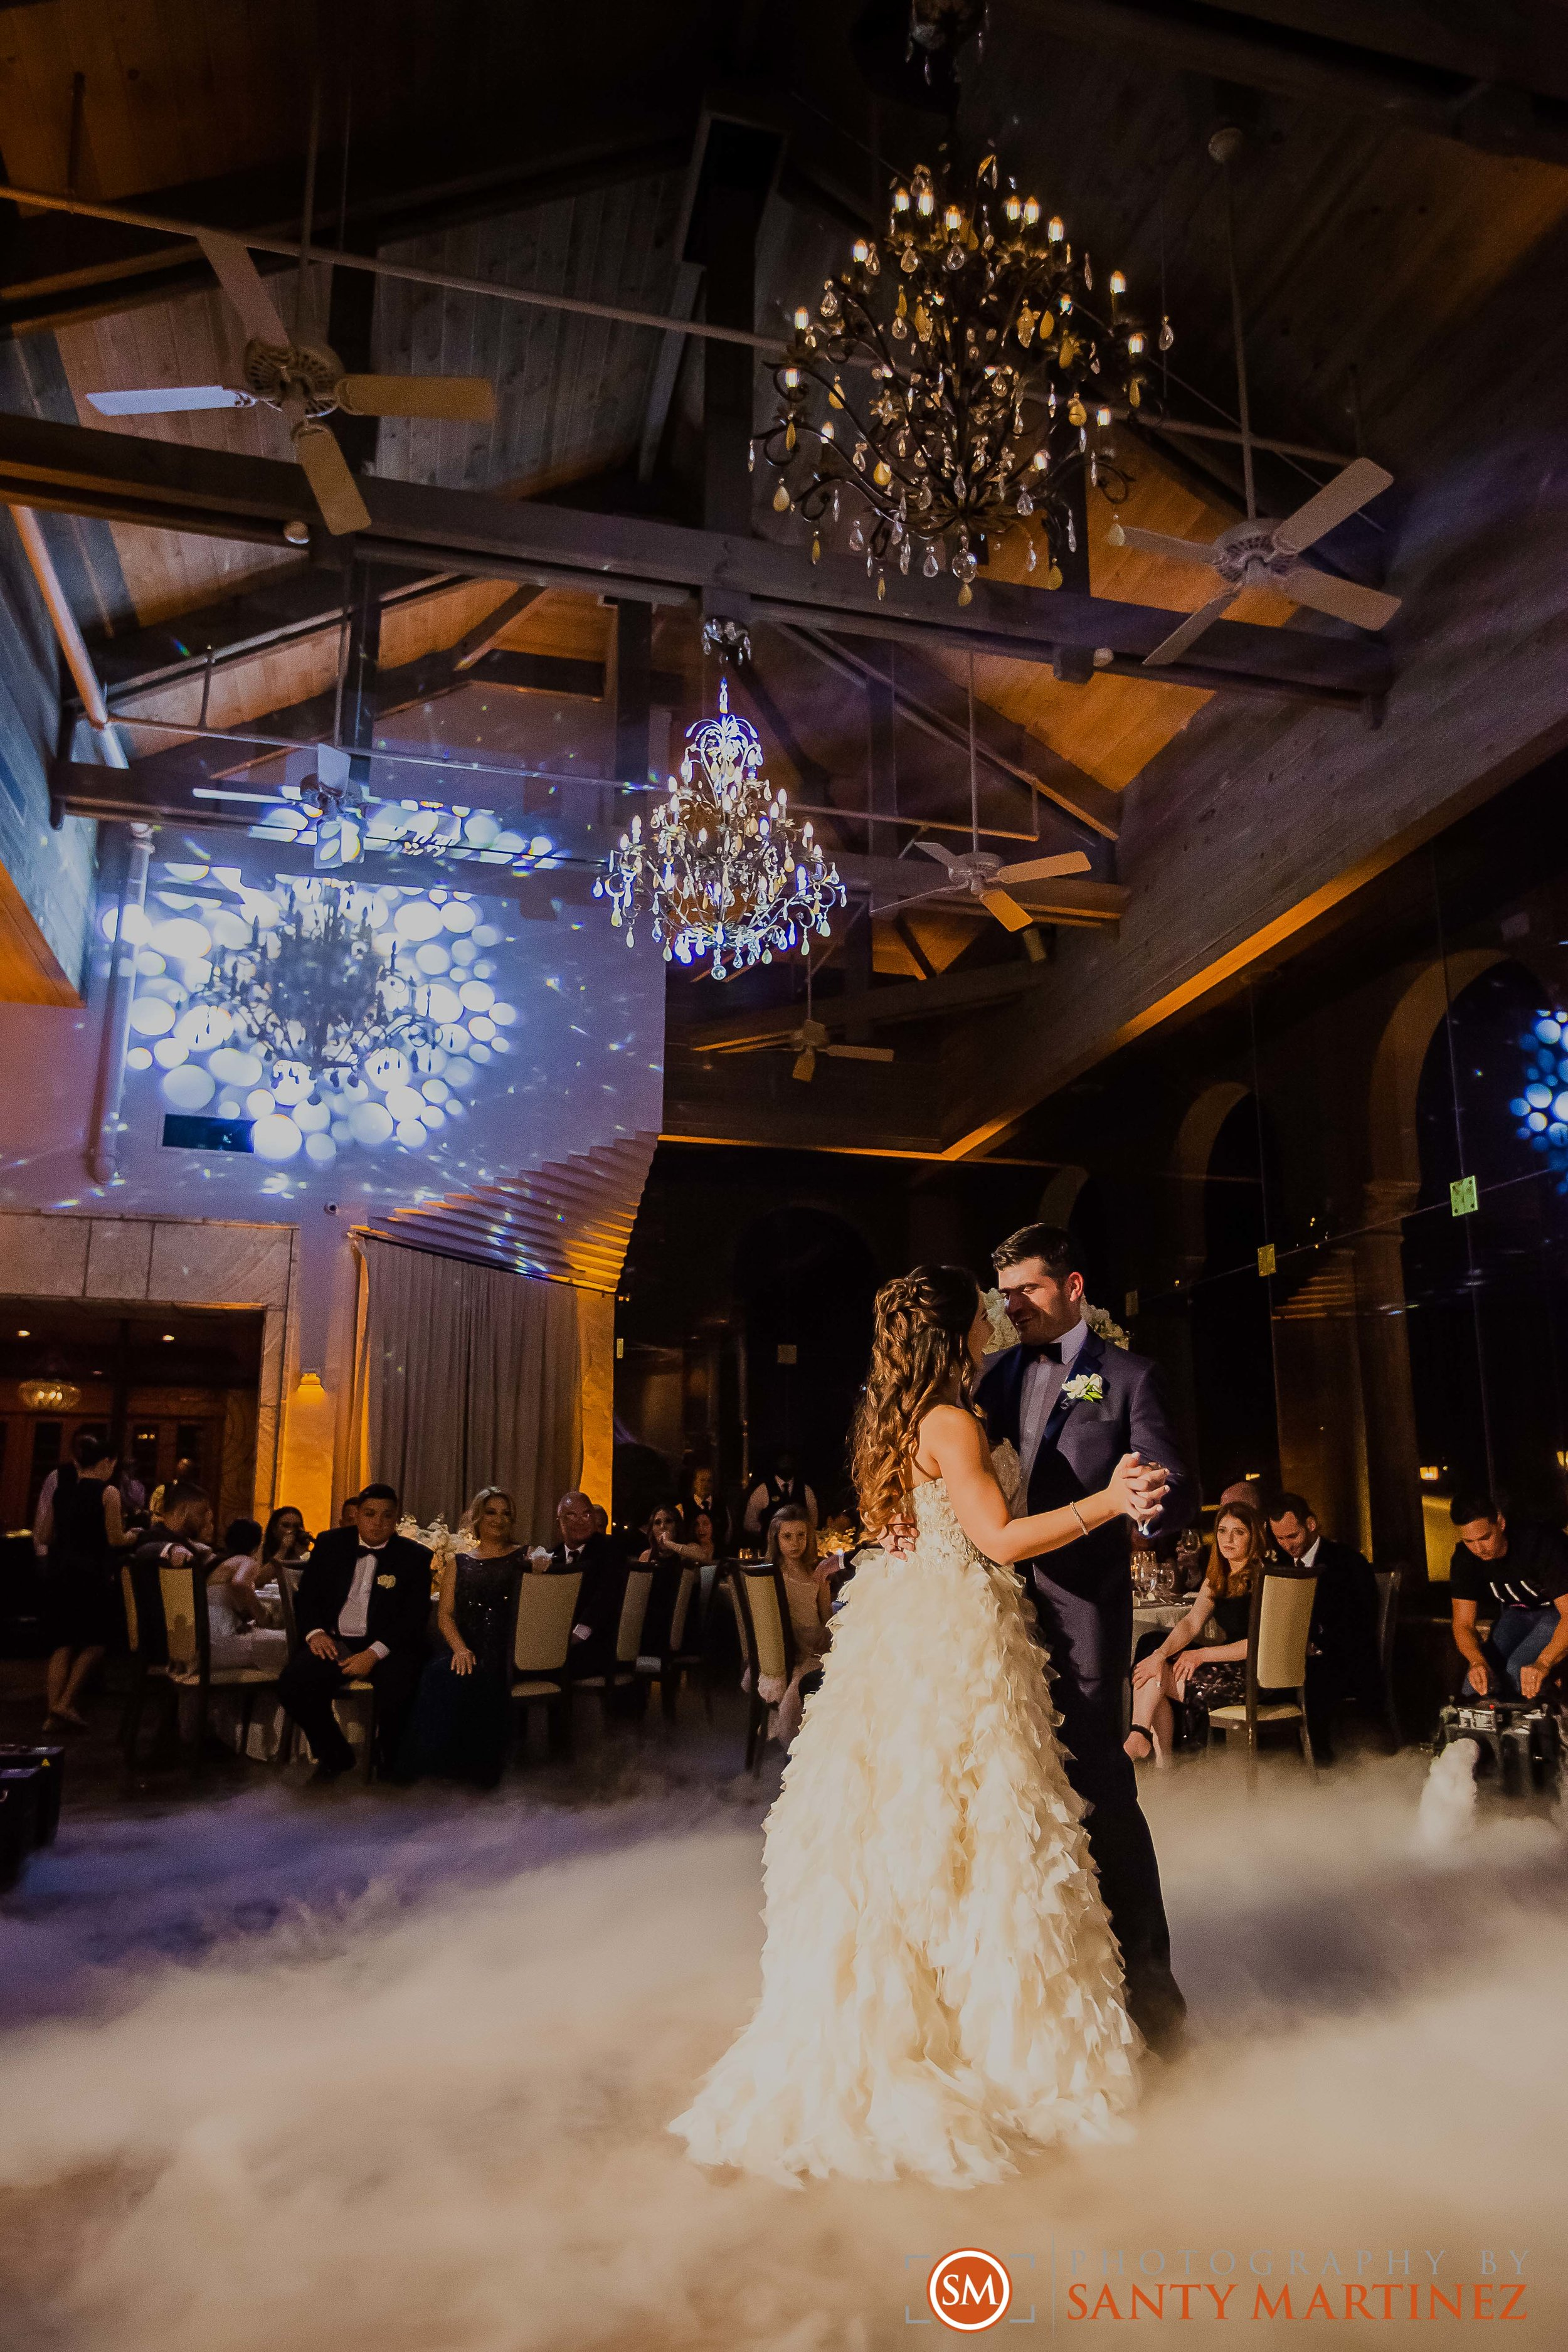 Wedding Coral Gables Country Club - Santy Martinez Photography-39.jpg